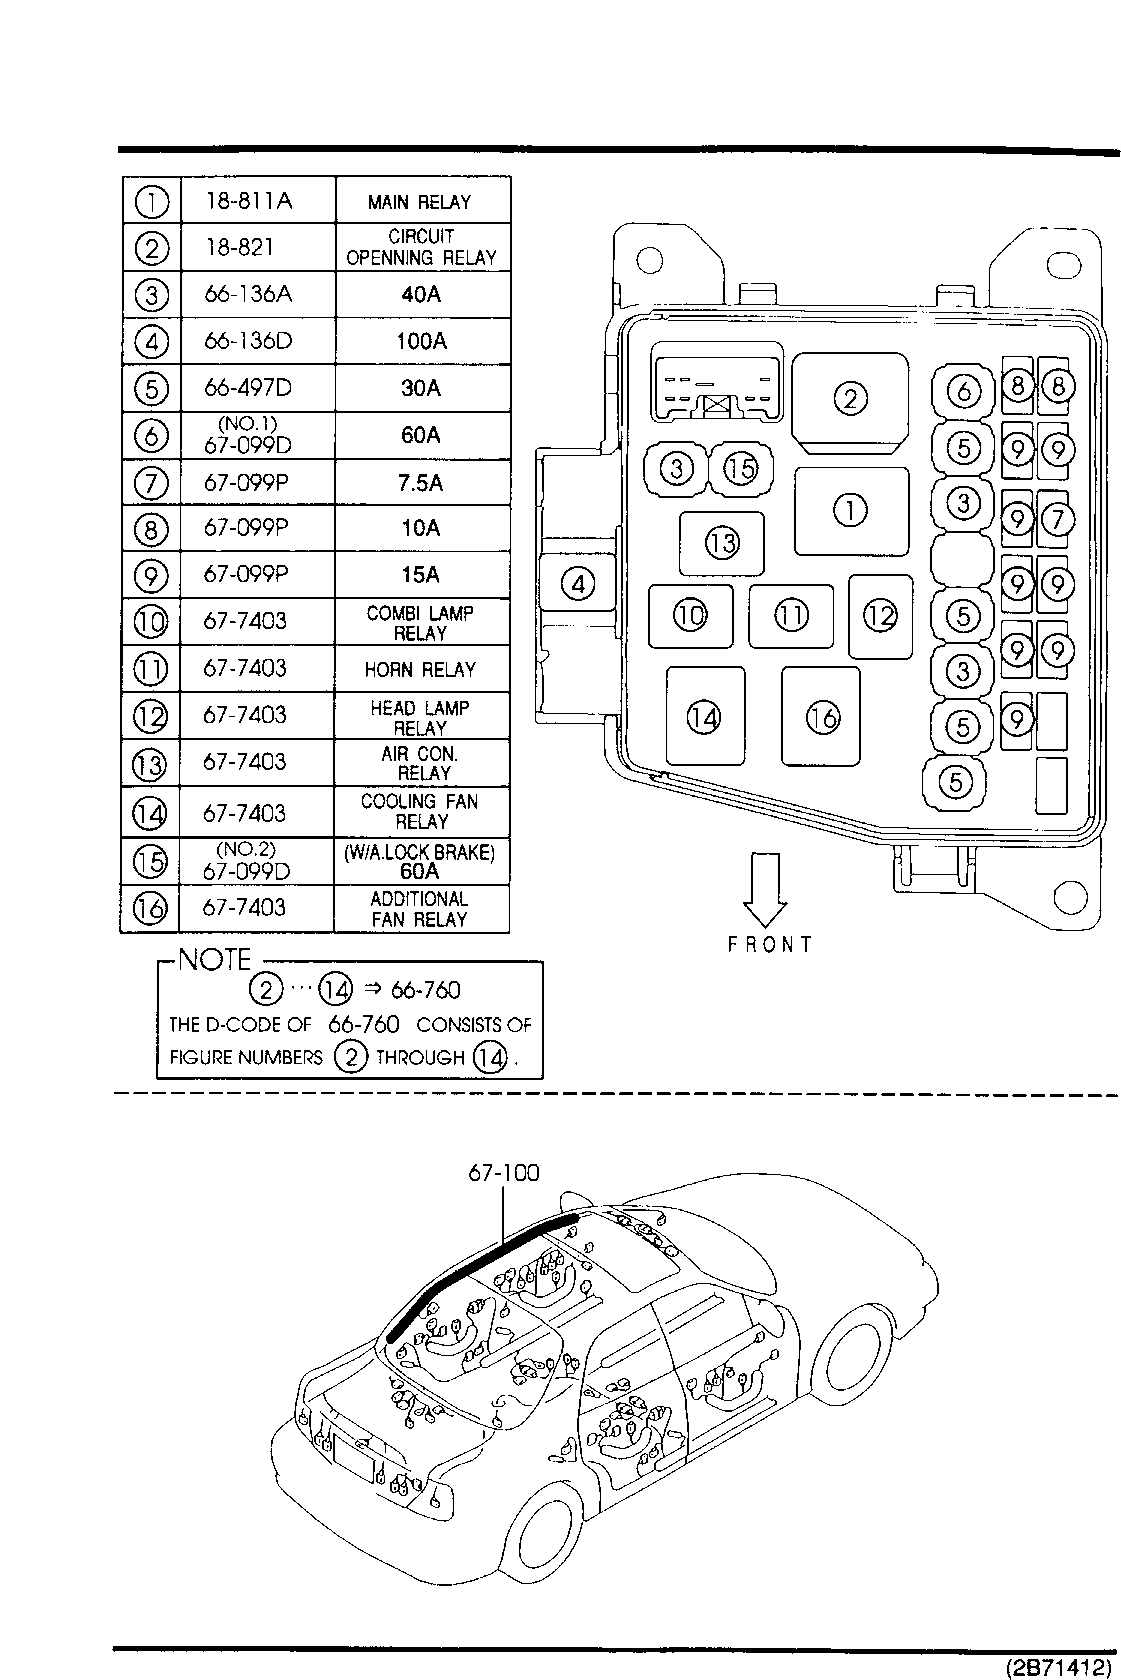 Wiring Diagram PDF: 2002 Mazda Protege5 Wiring Harness